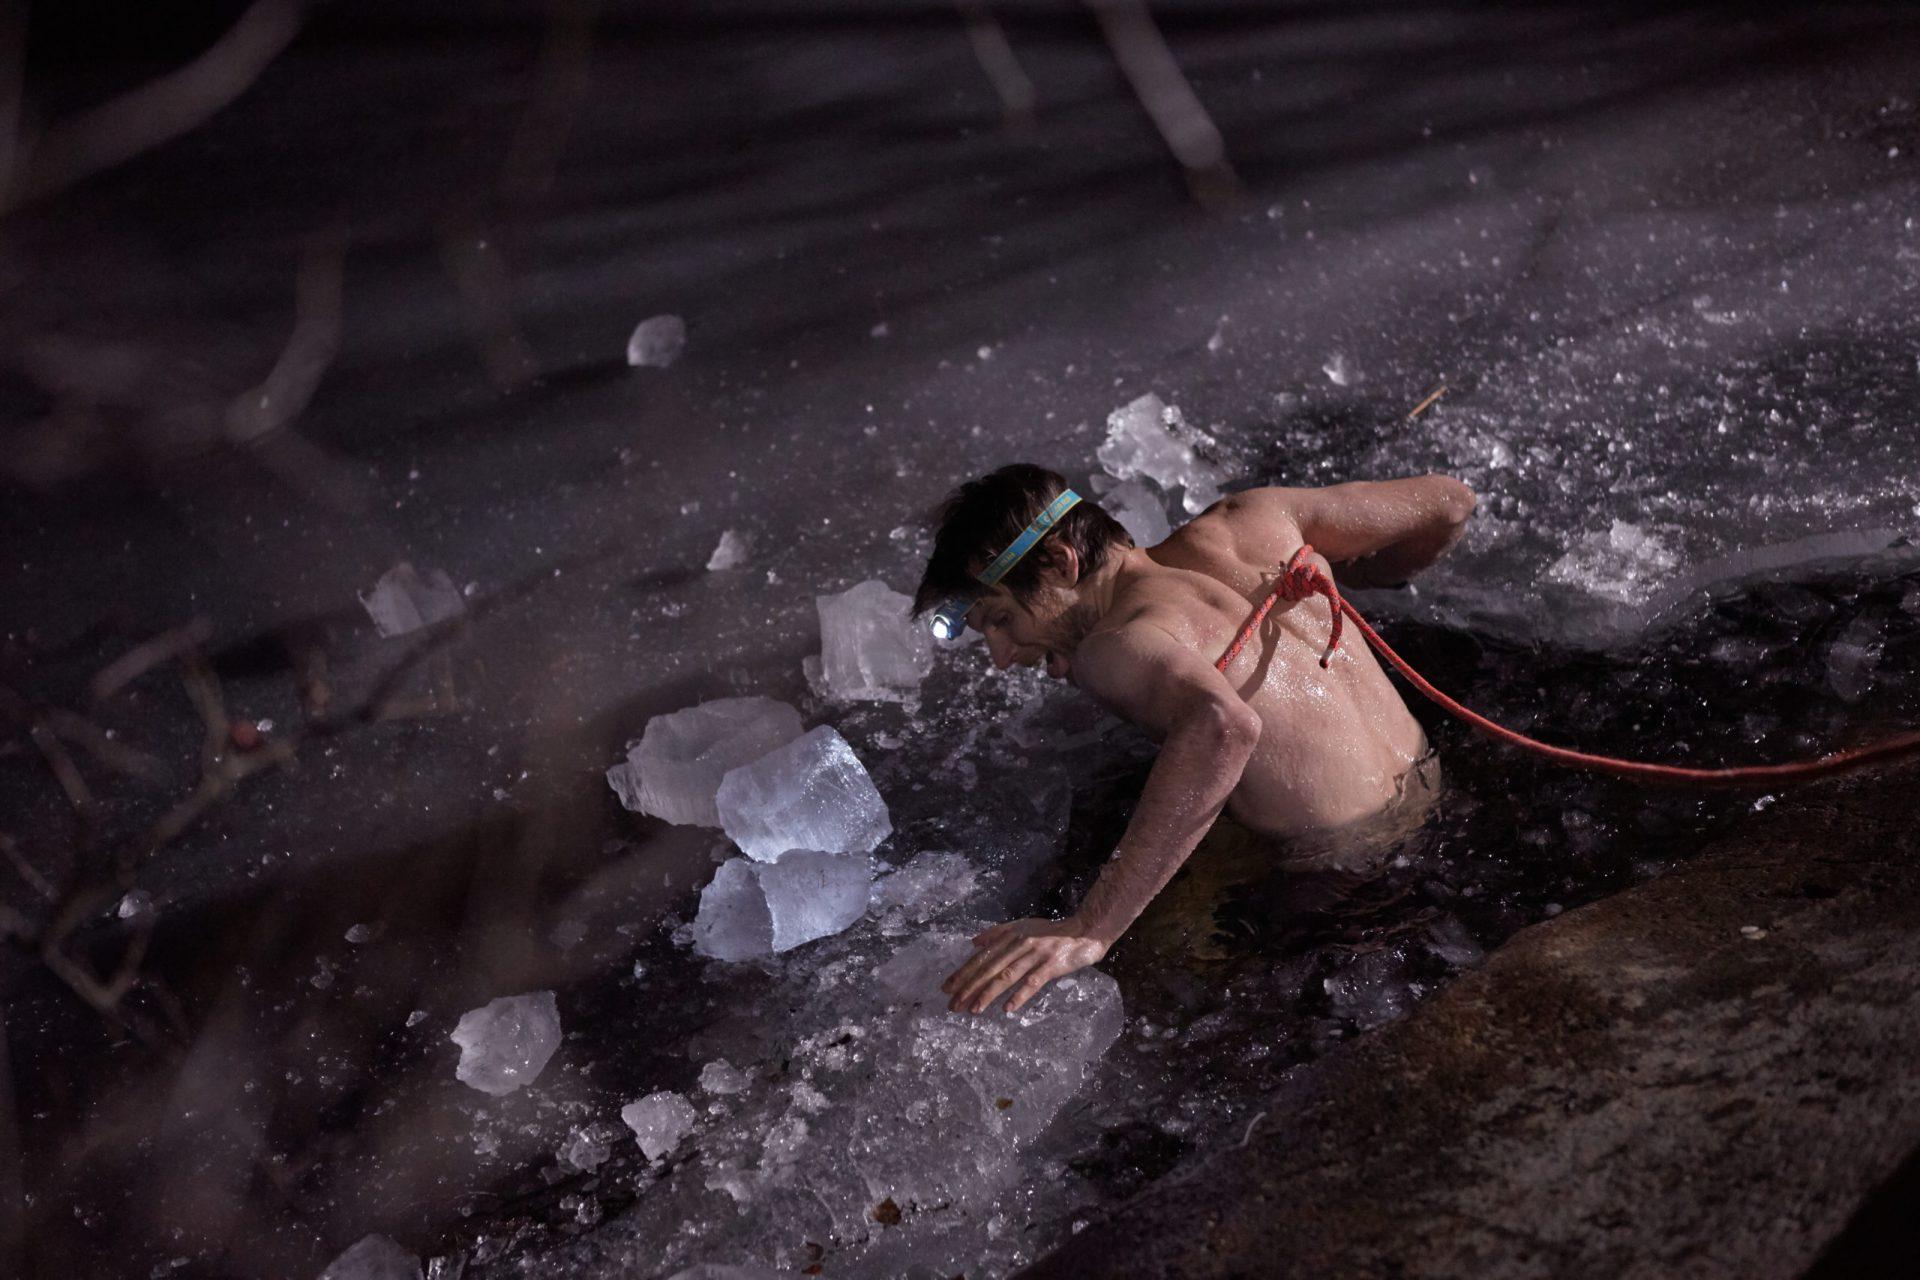 Milruck Winter Tough, Ice Bath